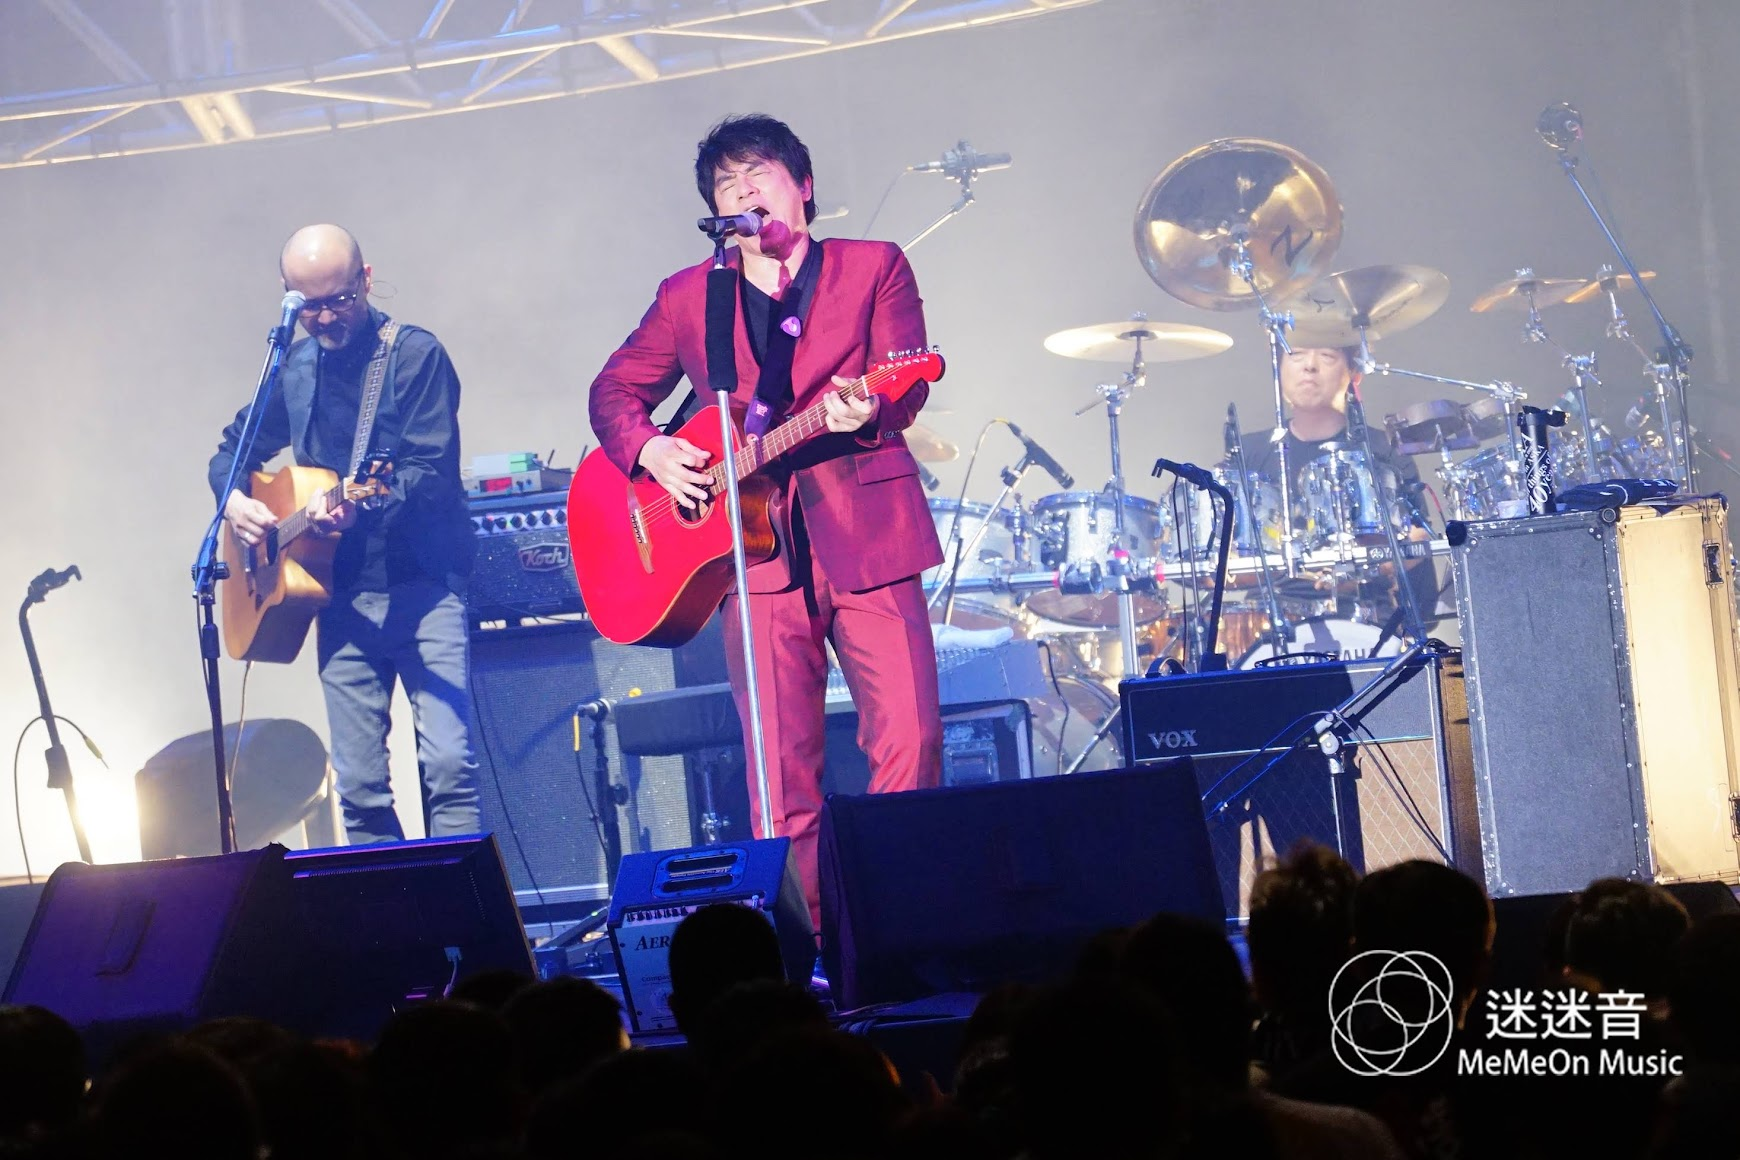 【迷迷歌單】2019 ASKA CONCERT TOUR 2019